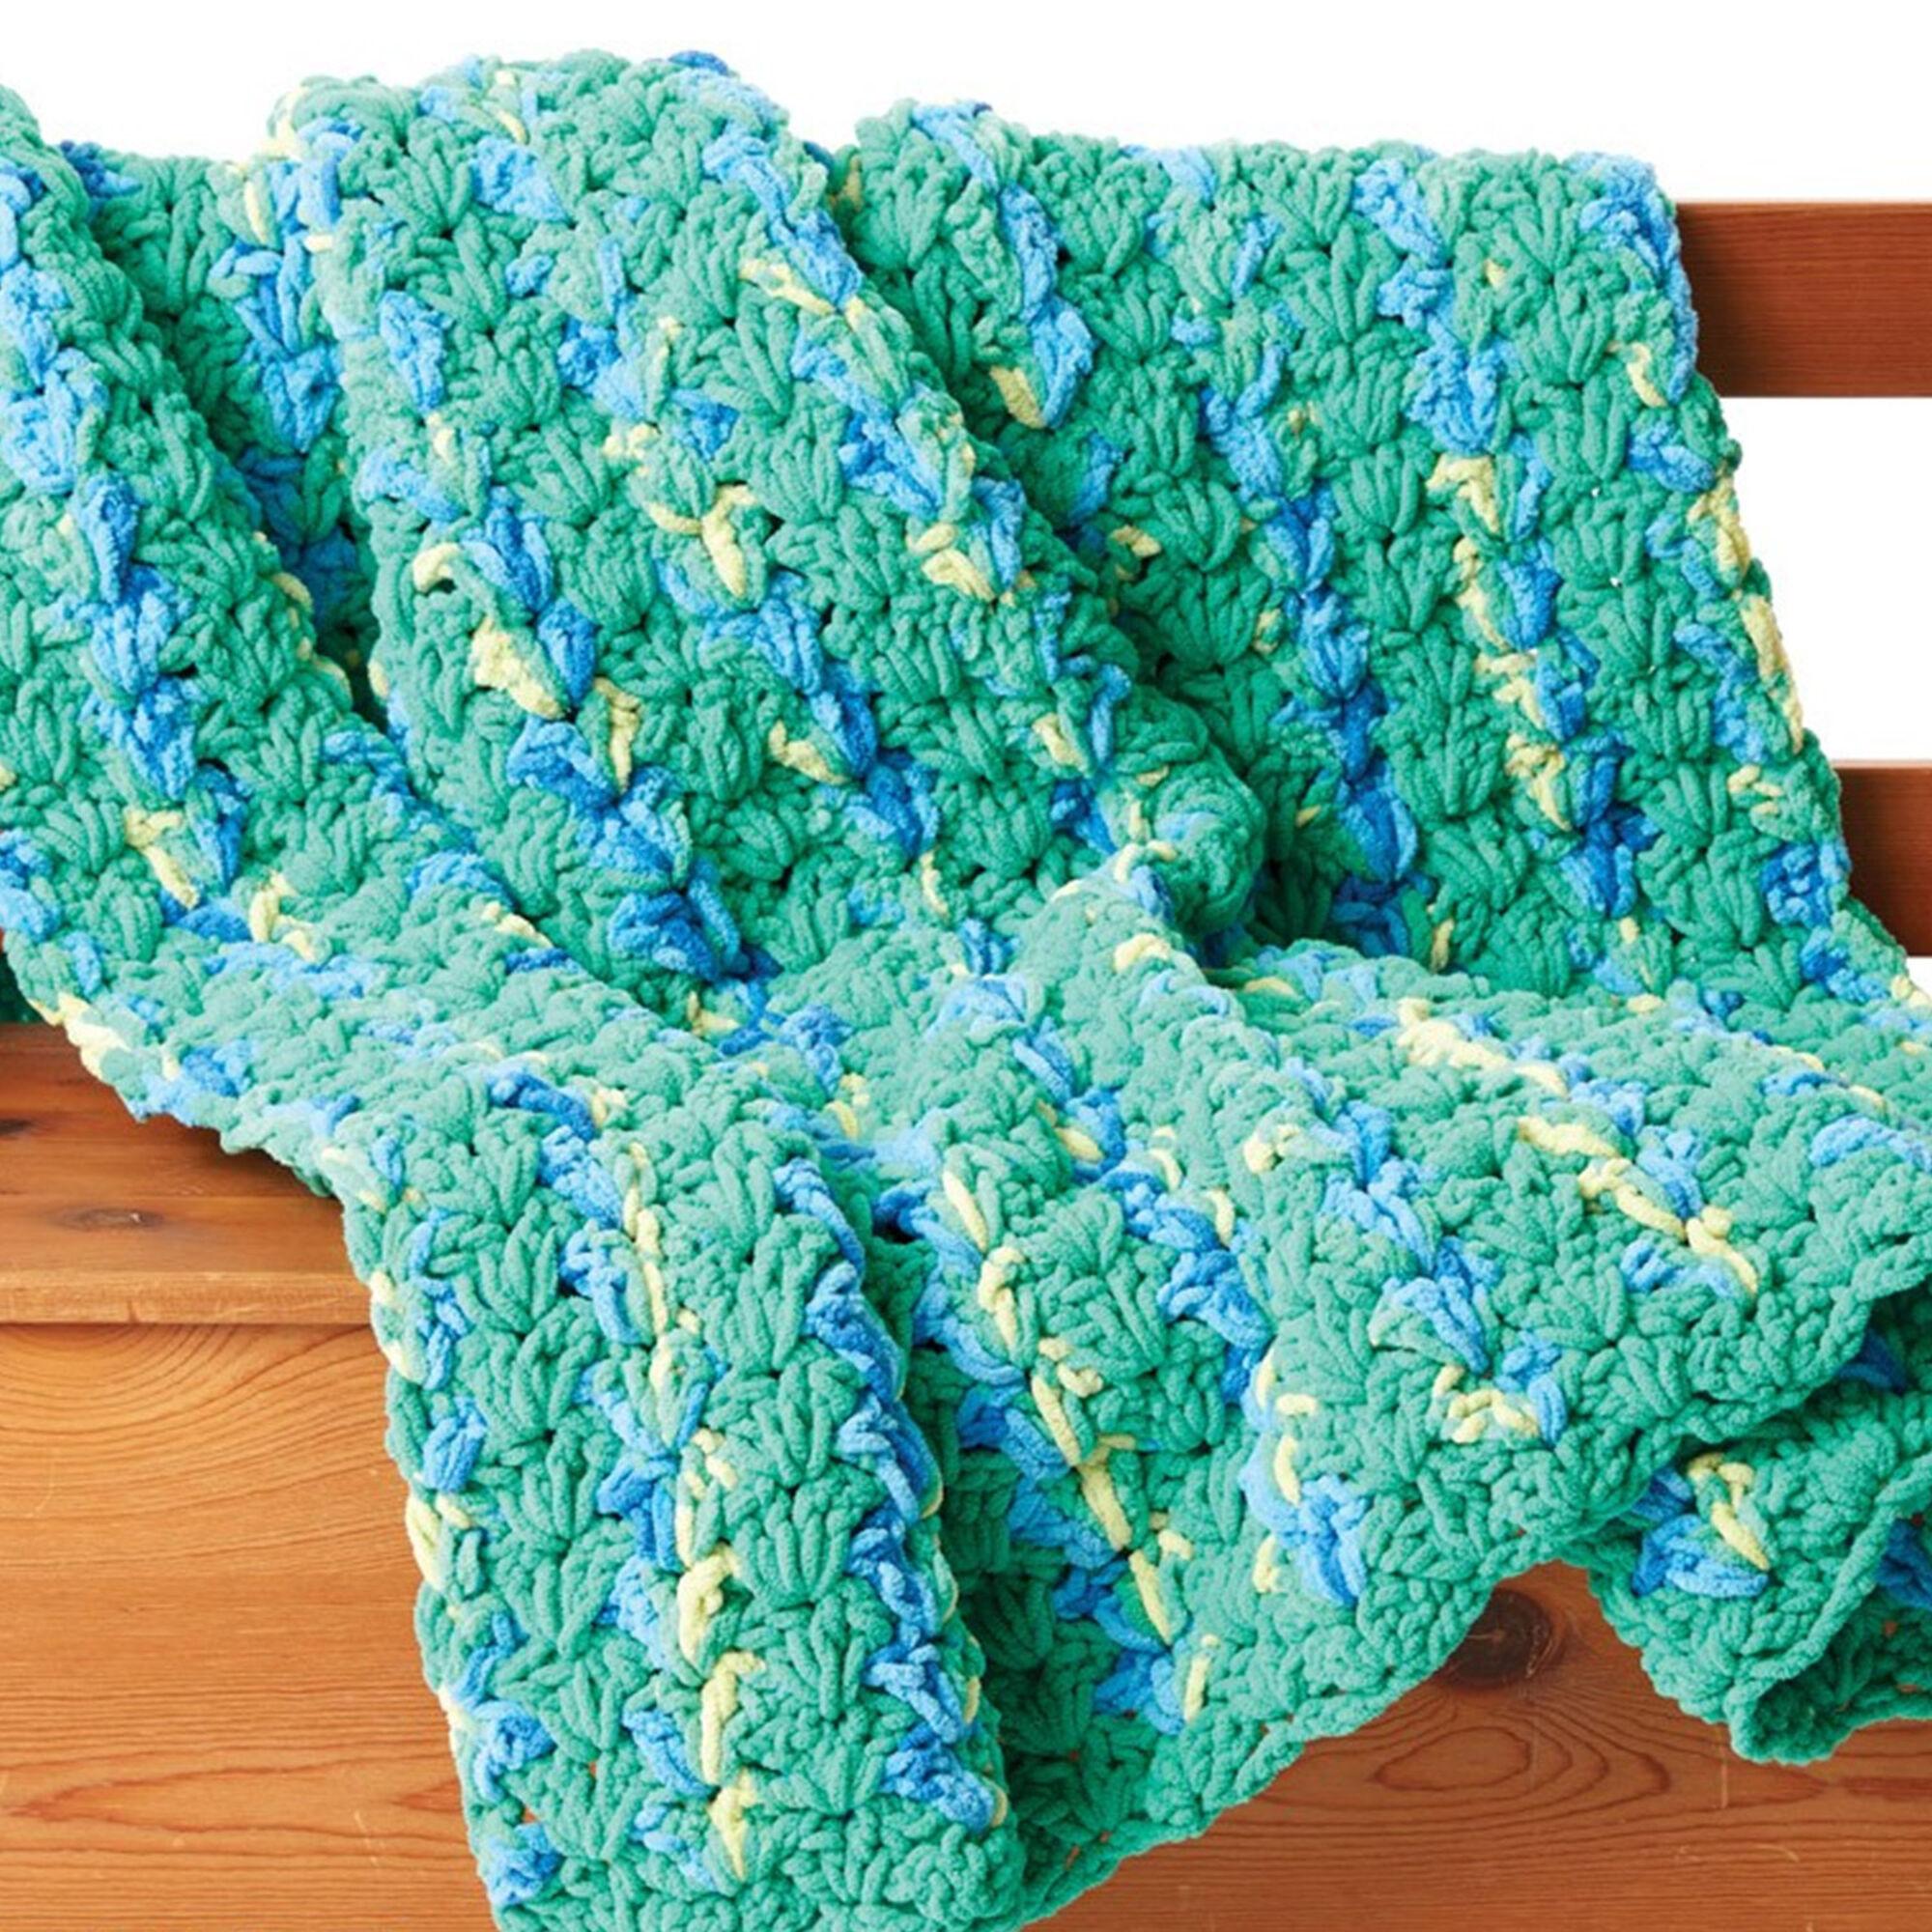 Bernat Bright and Easy Crochet Blanket | Yarnspirations